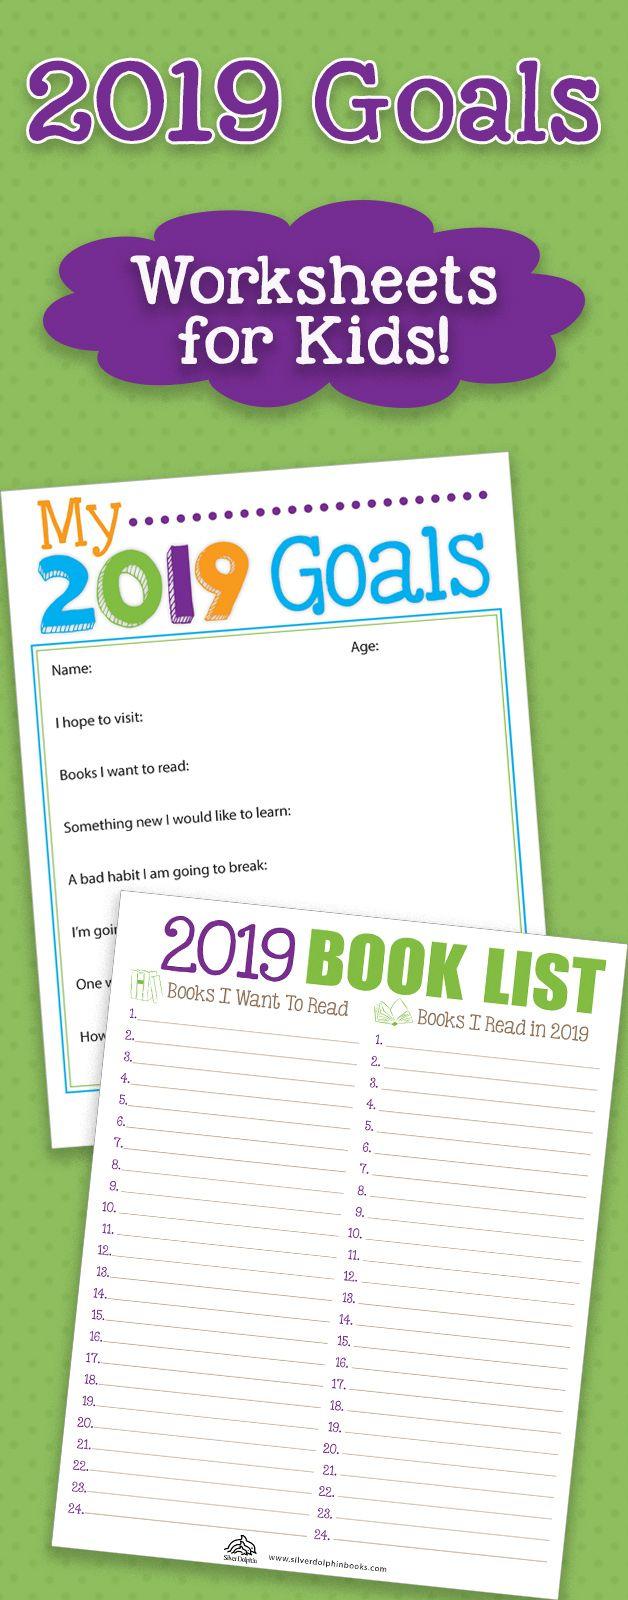 2019 Goal Setting Worksheets For Kids Worksheets For Kids Goals Worksheet Kids Goals [ 1600 x 628 Pixel ]